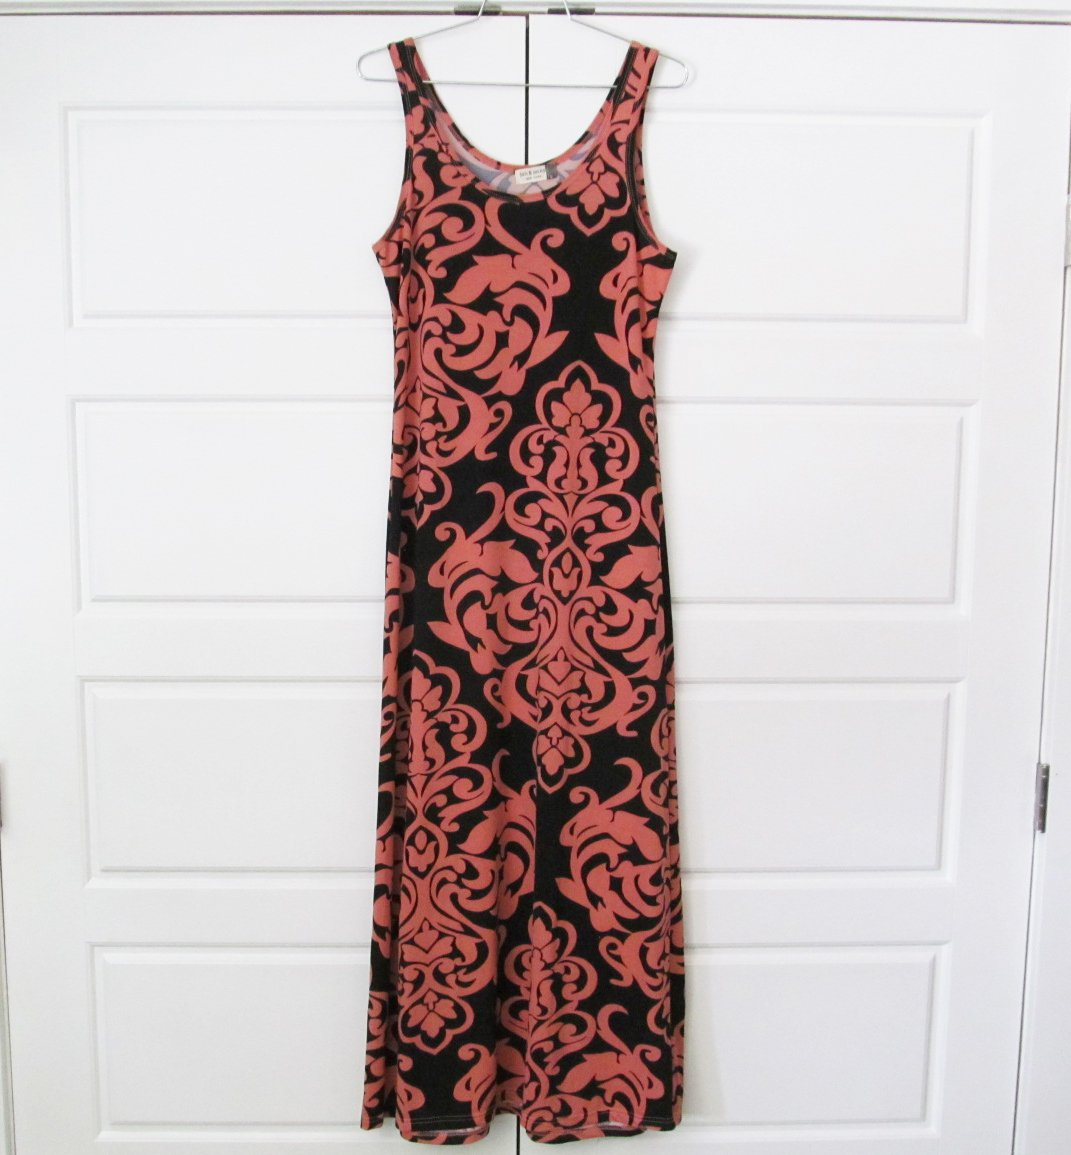 jon & anna Damask Print Maxi Dress Long Black Salmon Pink Womens Large L New